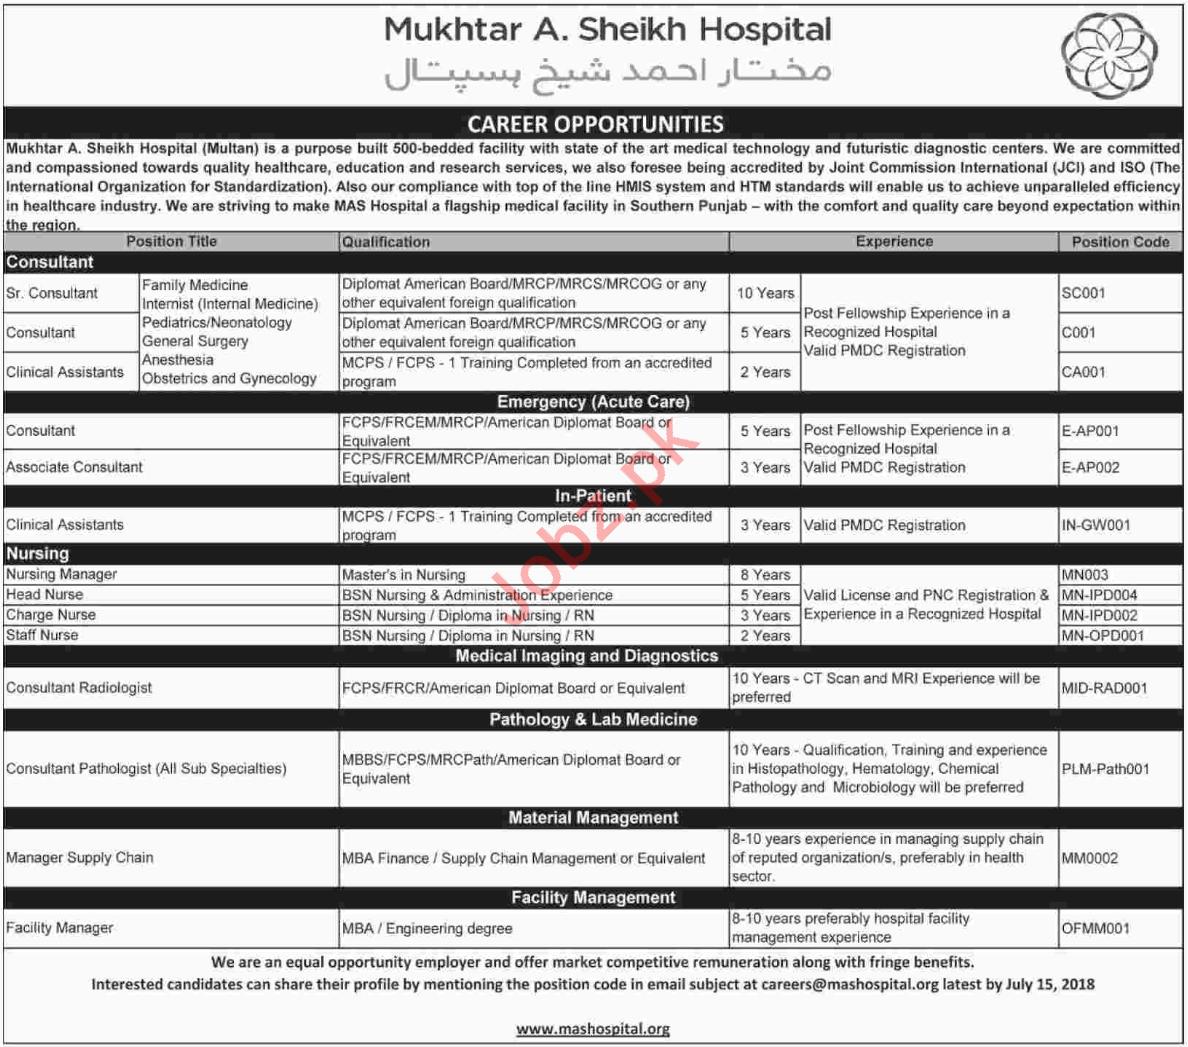 Mukhtar A Sheikh Hospital Multan Jobs 2018 for Consultants